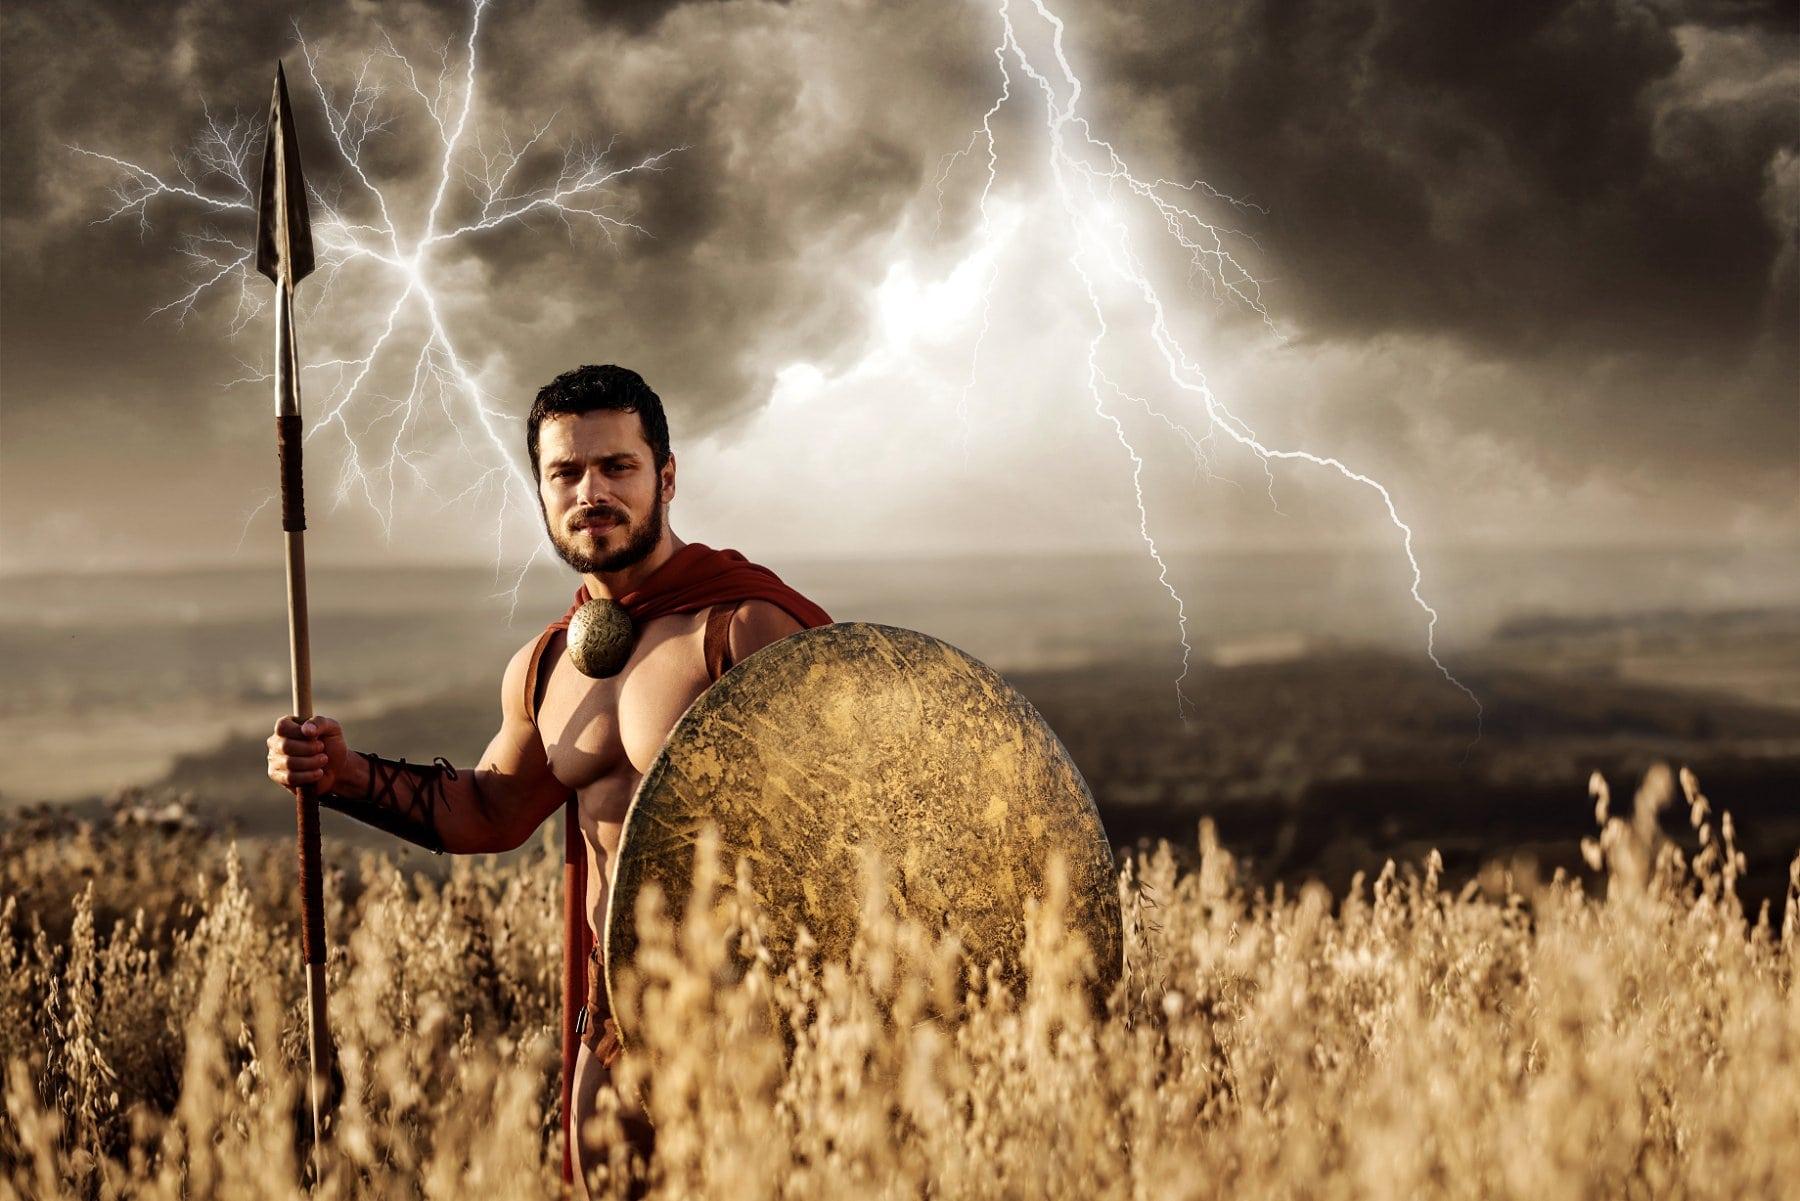 160+ Realistic Lightning Overlays - $15 - fotolia 136543143 subscription monthly xxl восстановлено min